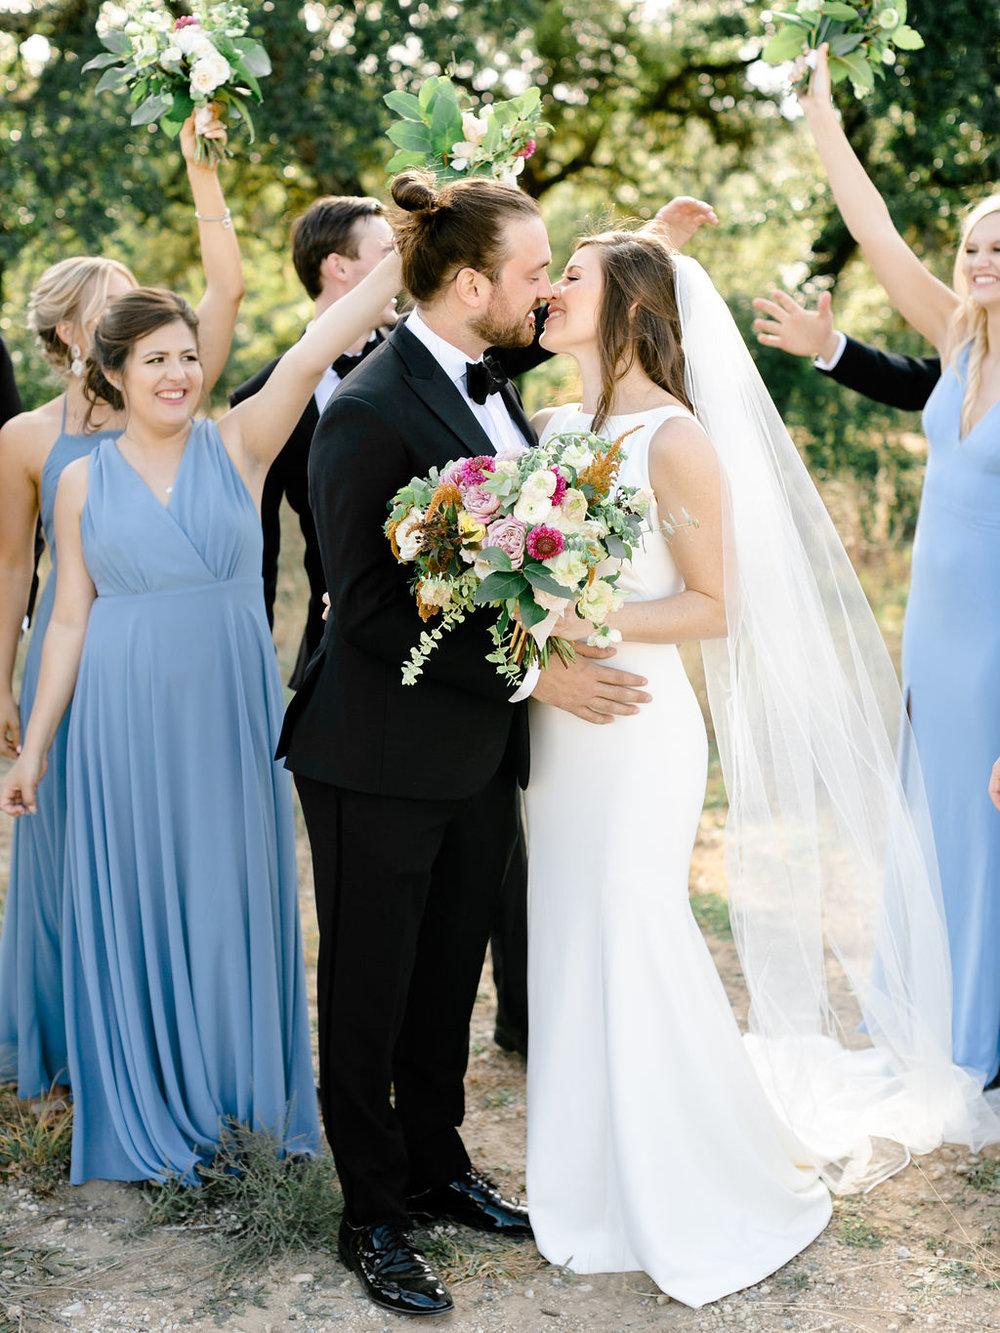 Austin-Texas-Wedding-Photographer-Addison-Grove-Film-69.jpg